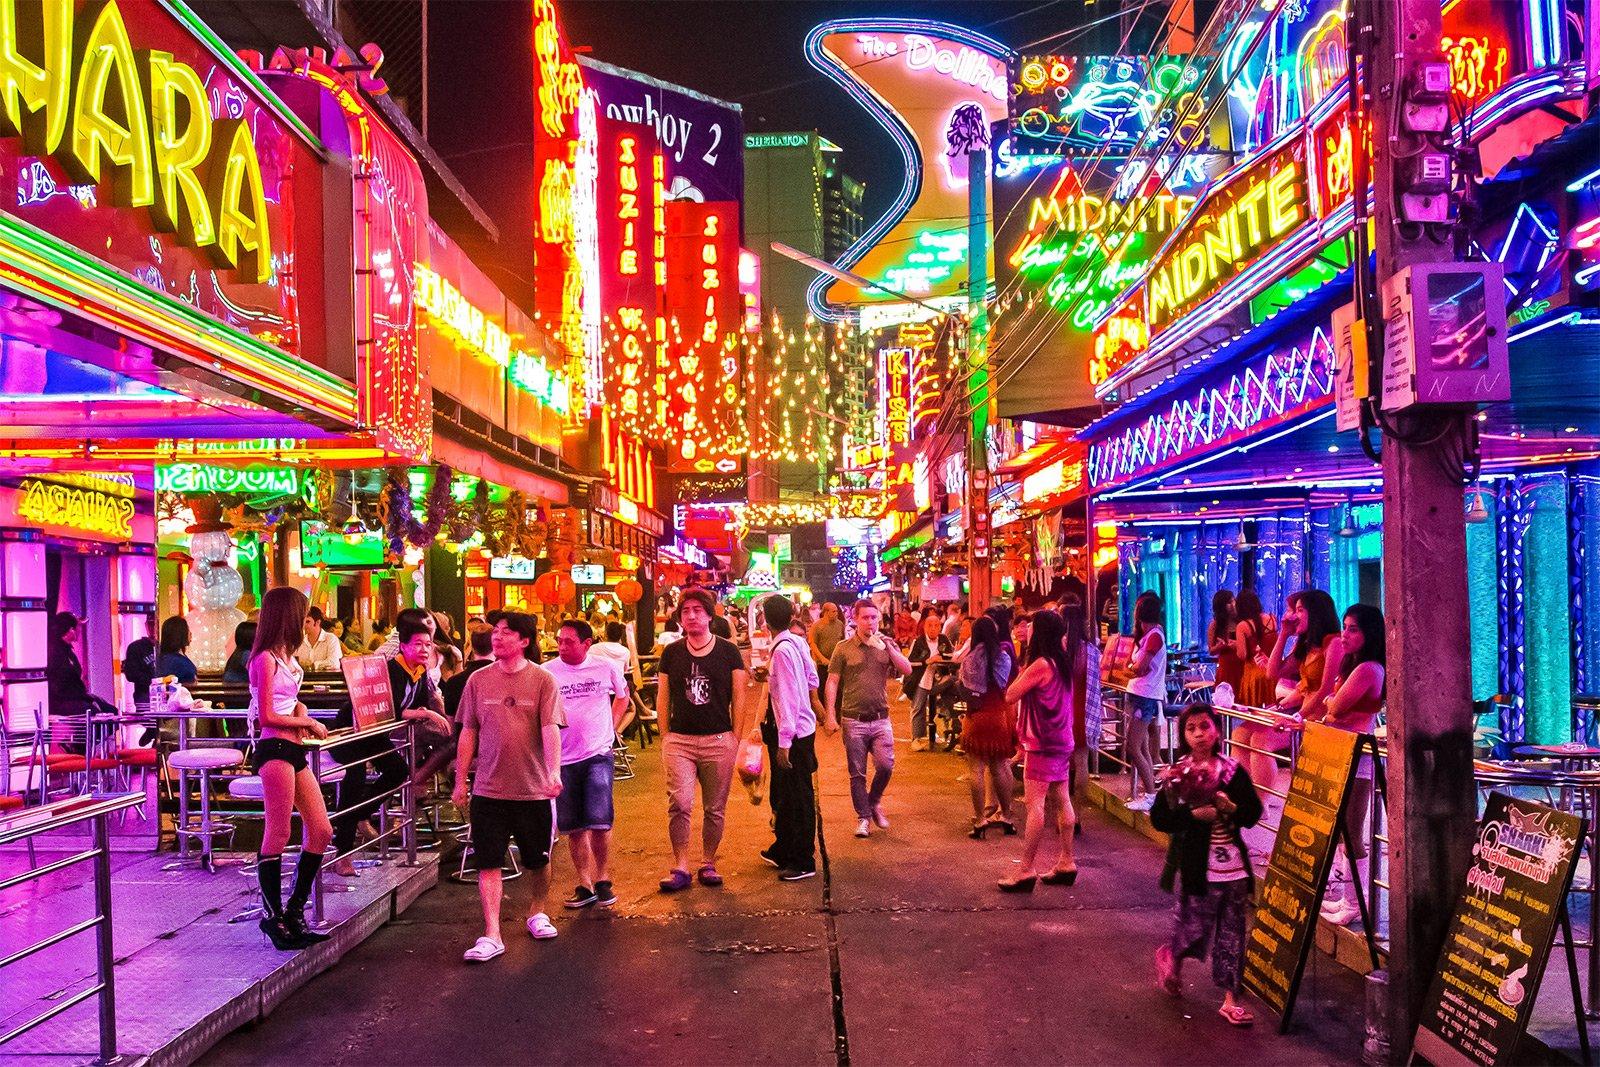 Soi Cowboy Street Bangkok